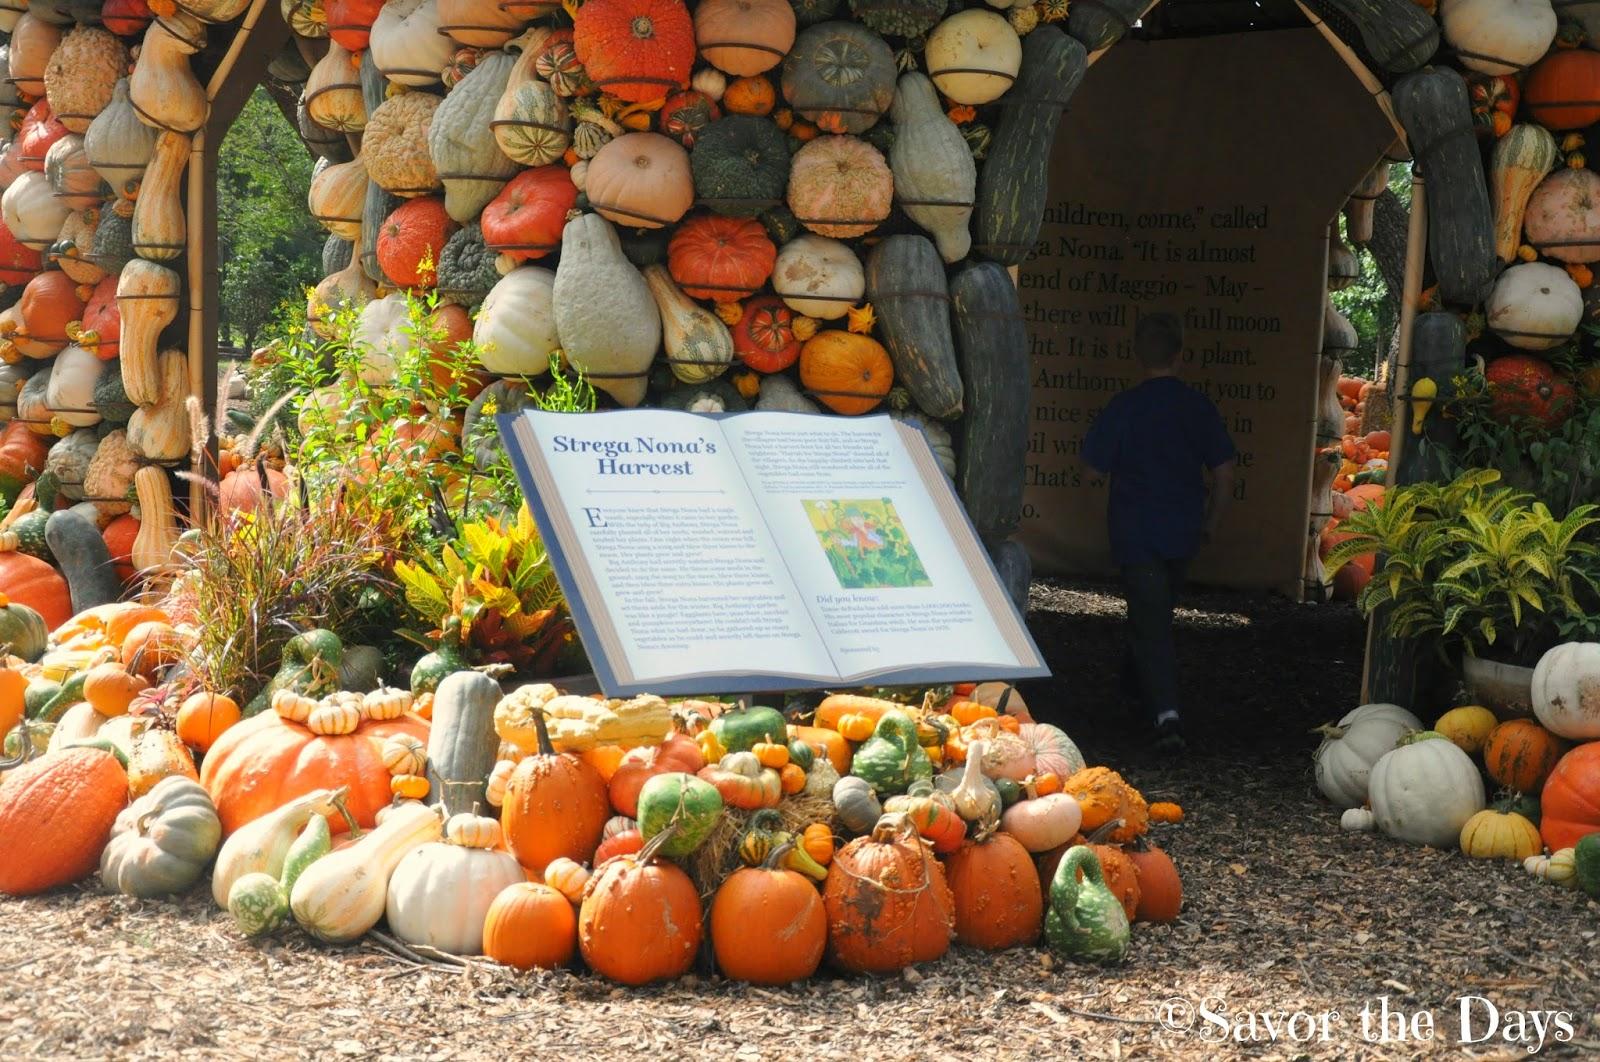 Savor The Days Pumpkin Village At The Dallas Arboretum